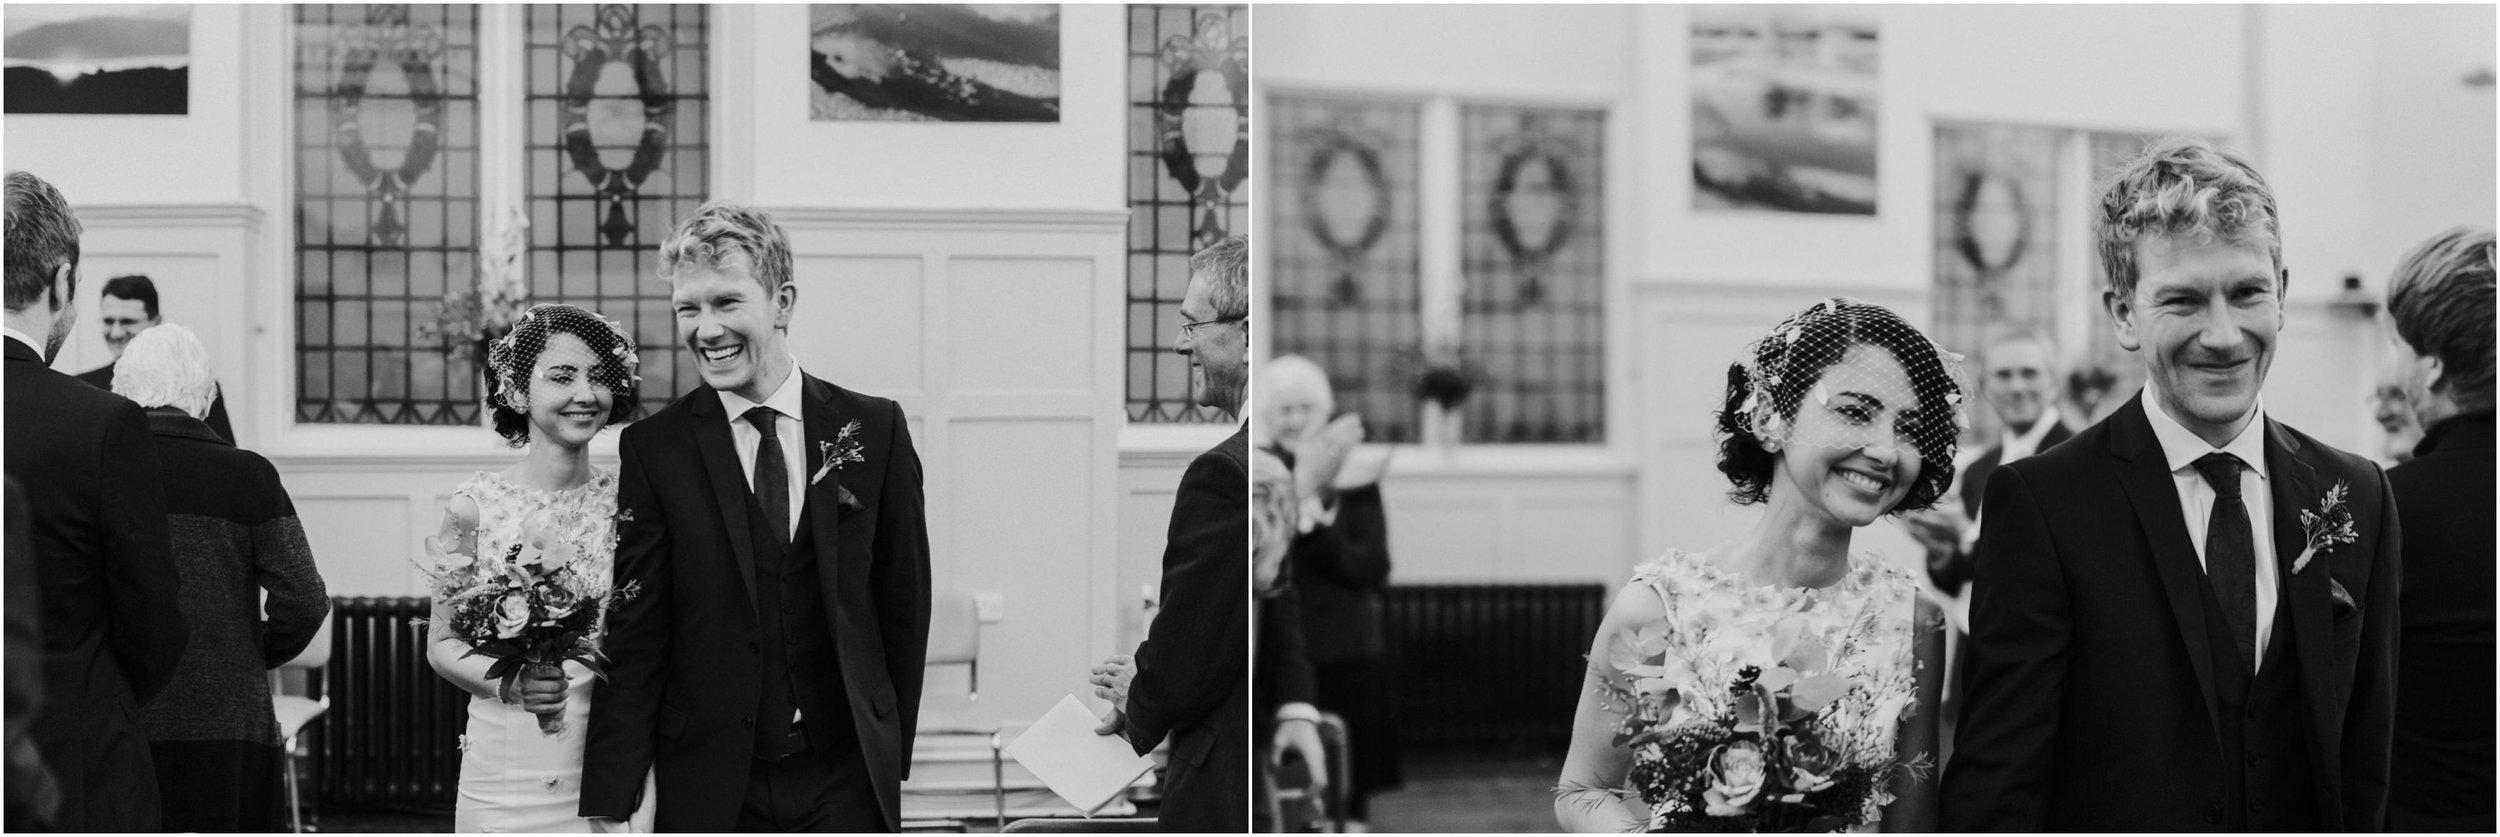 Photography 78 - Glasgow Wedding Photographer - Mike & Karol - Ubiquitous Chip Ashton Lane_0028.jpg